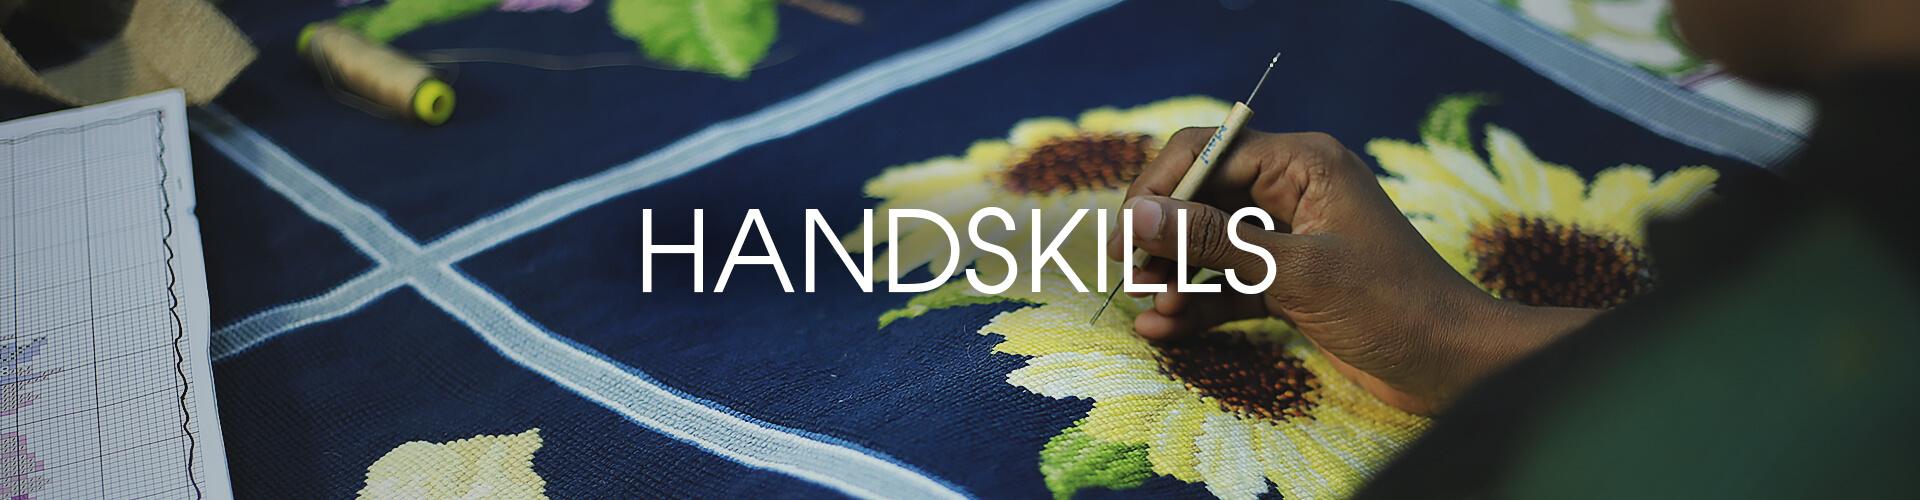 handskills